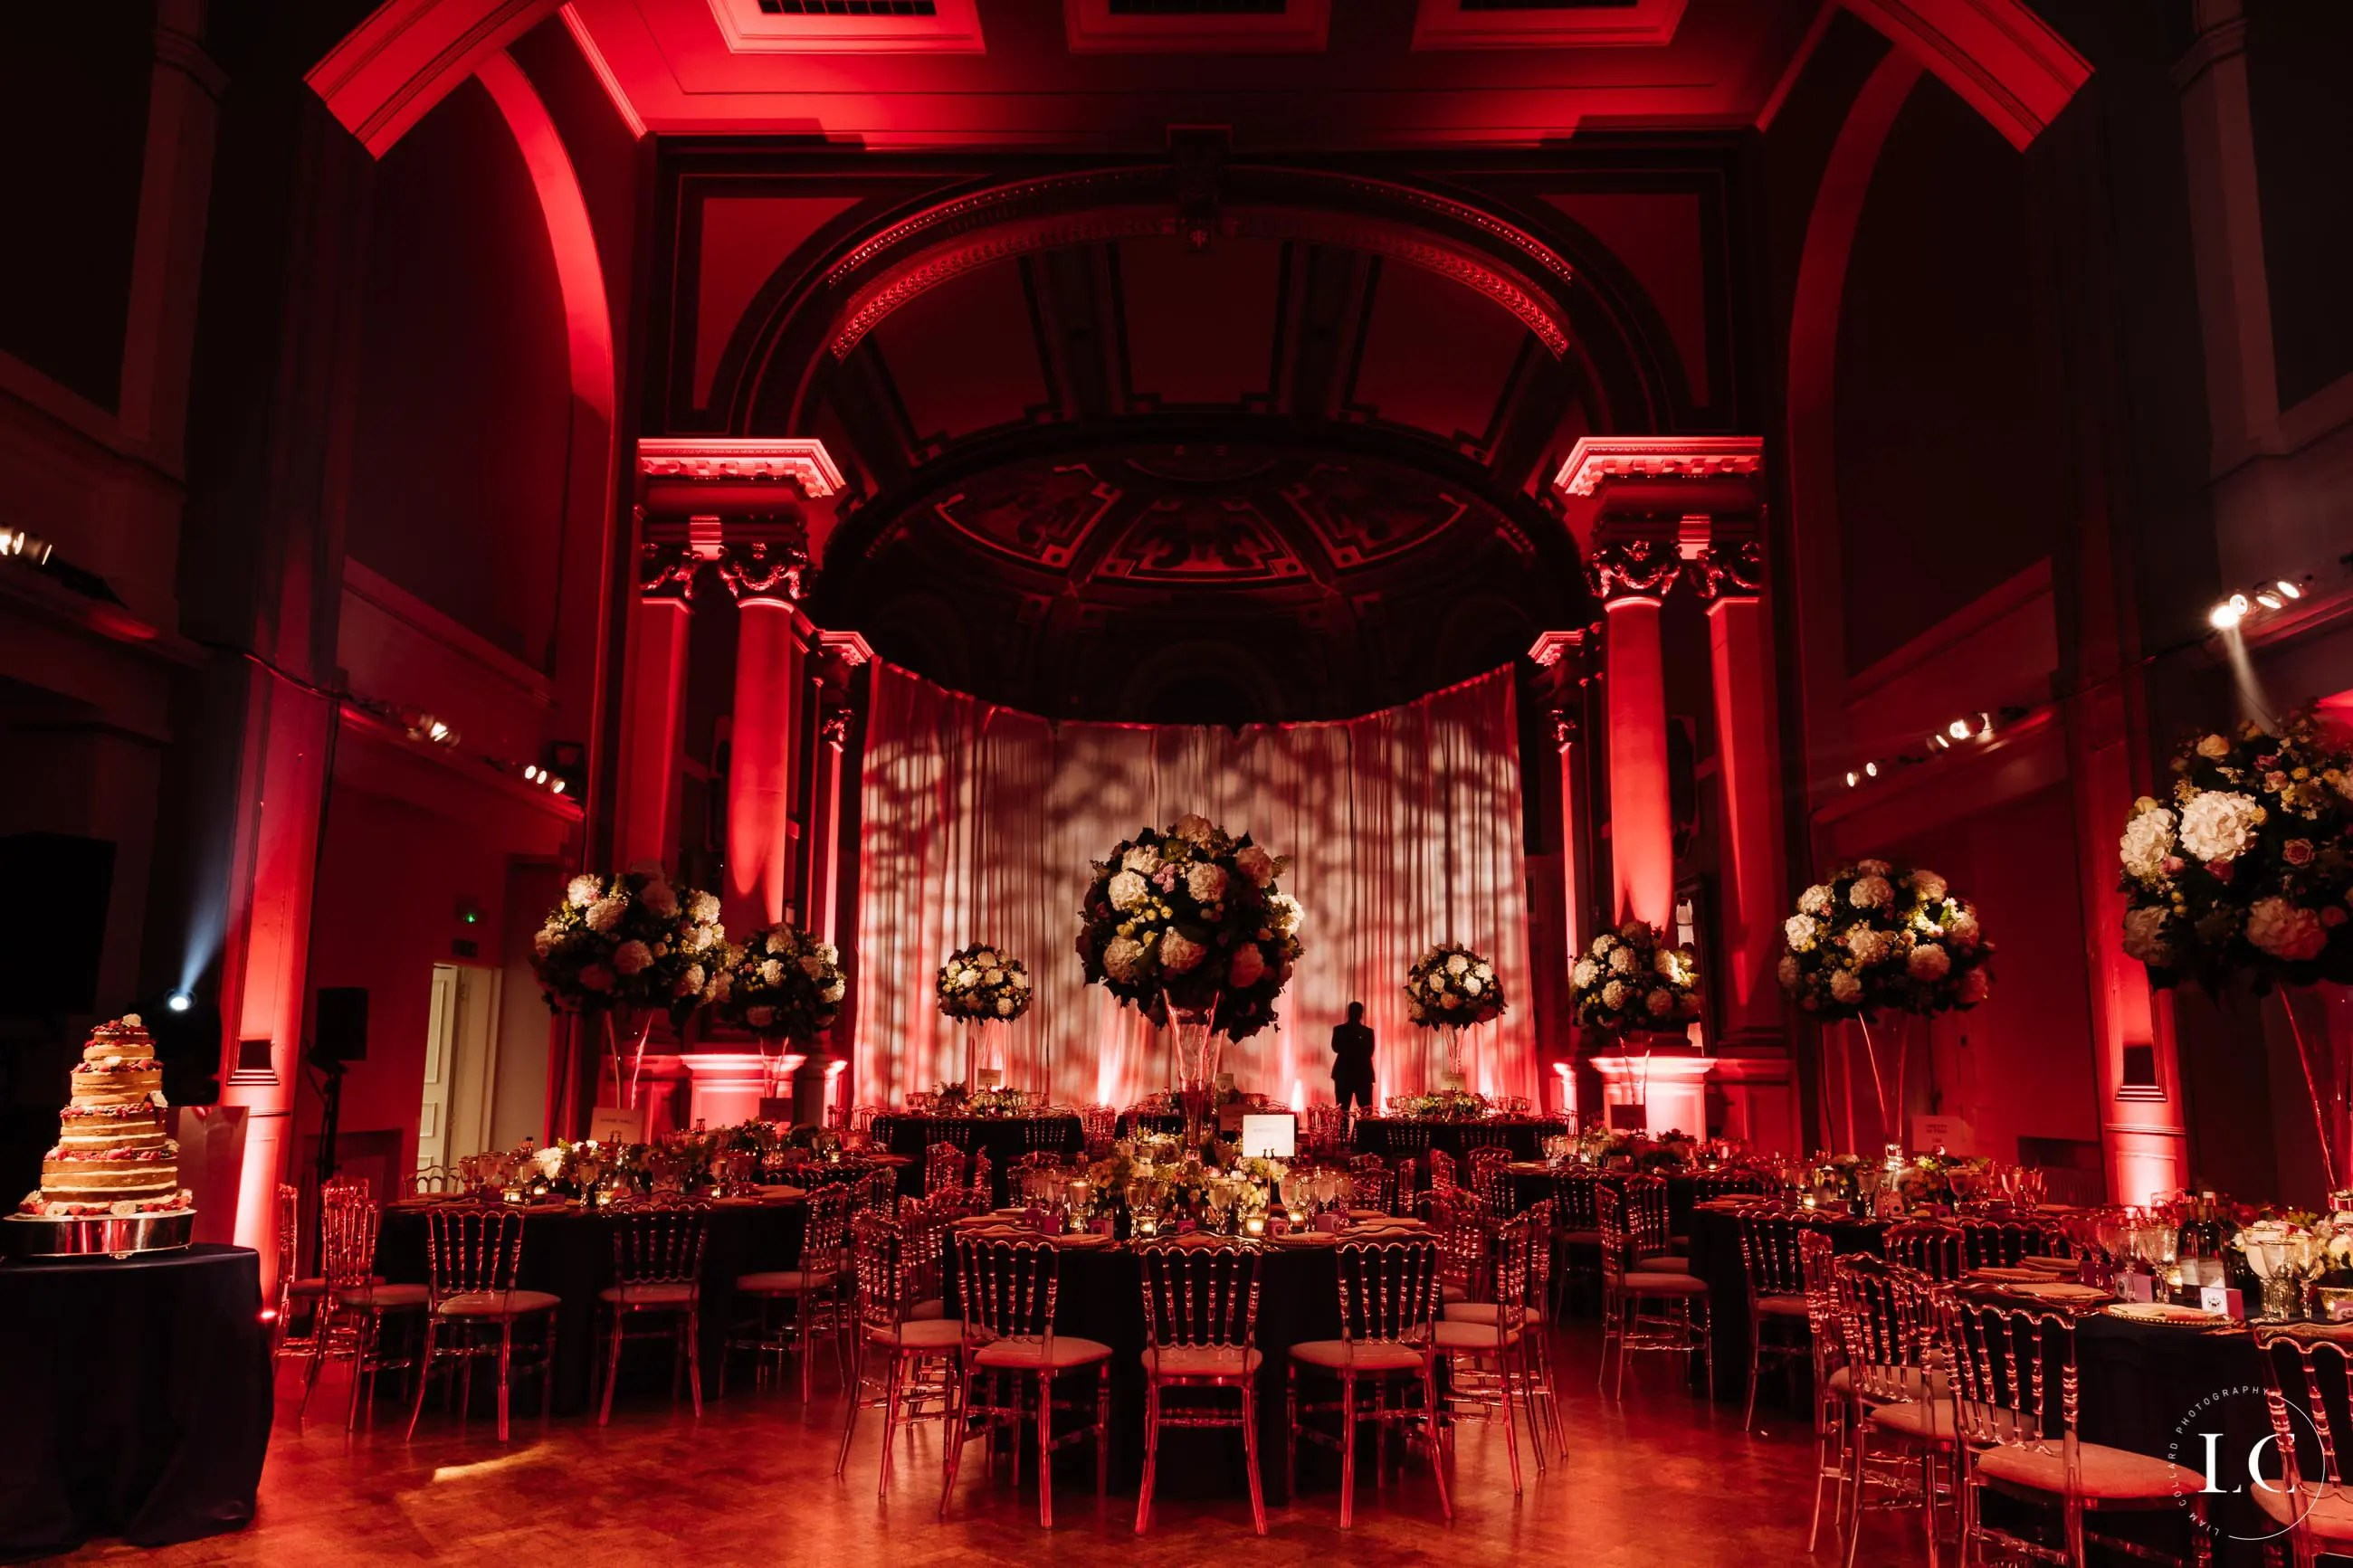 Wedding venue red lighting